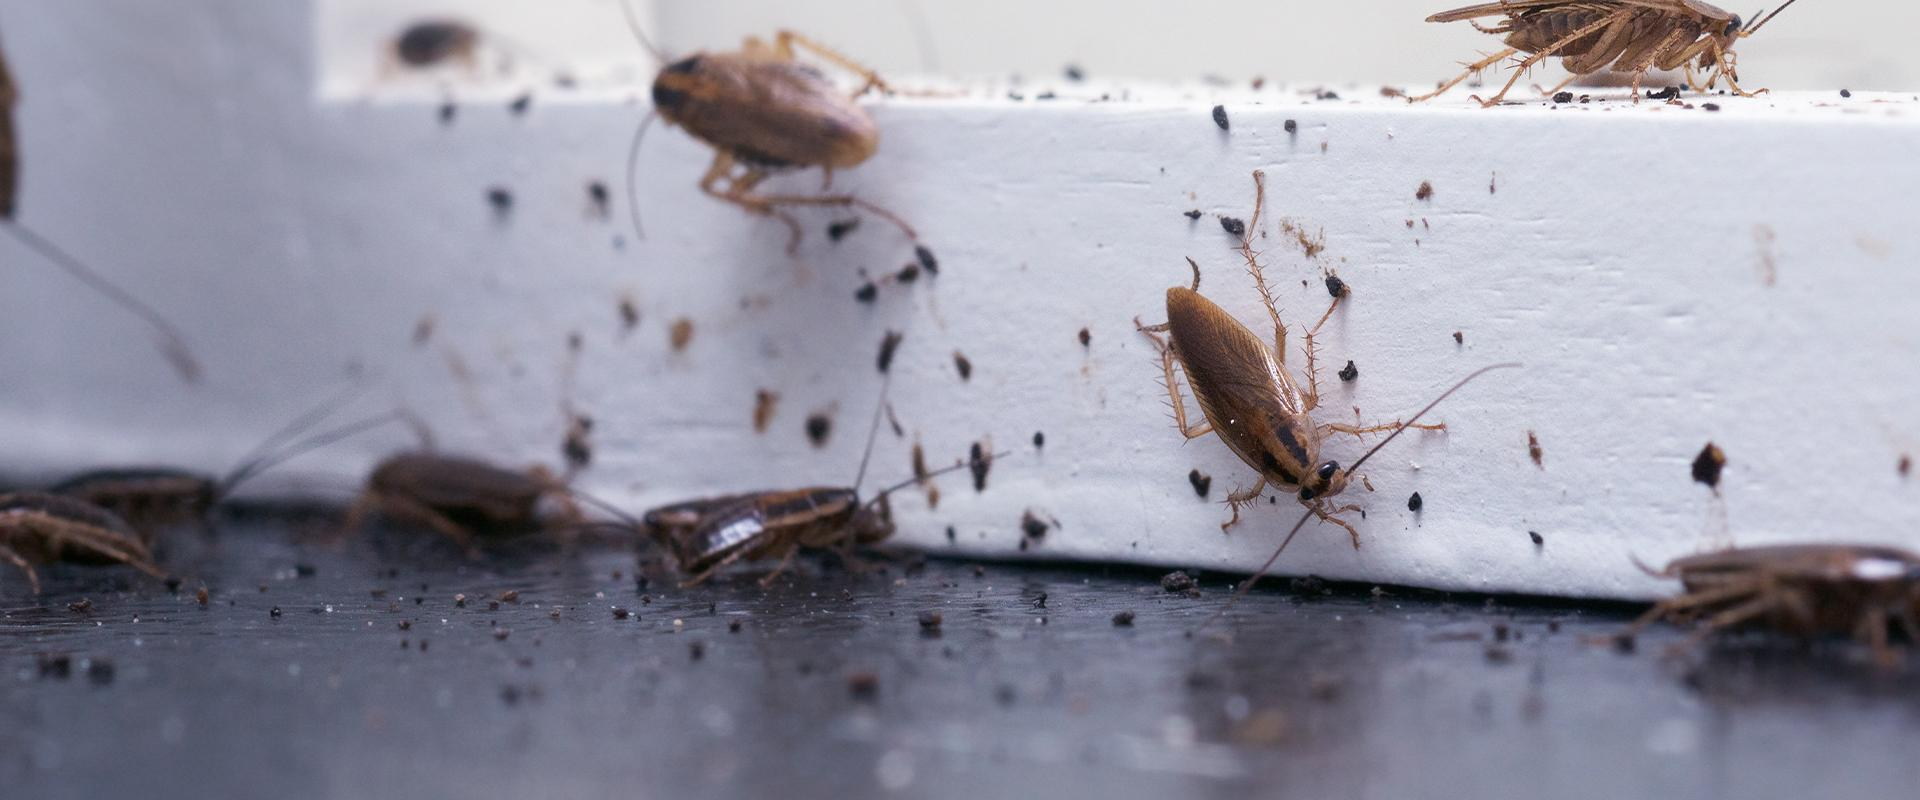 cockroaches crawling around windowsill